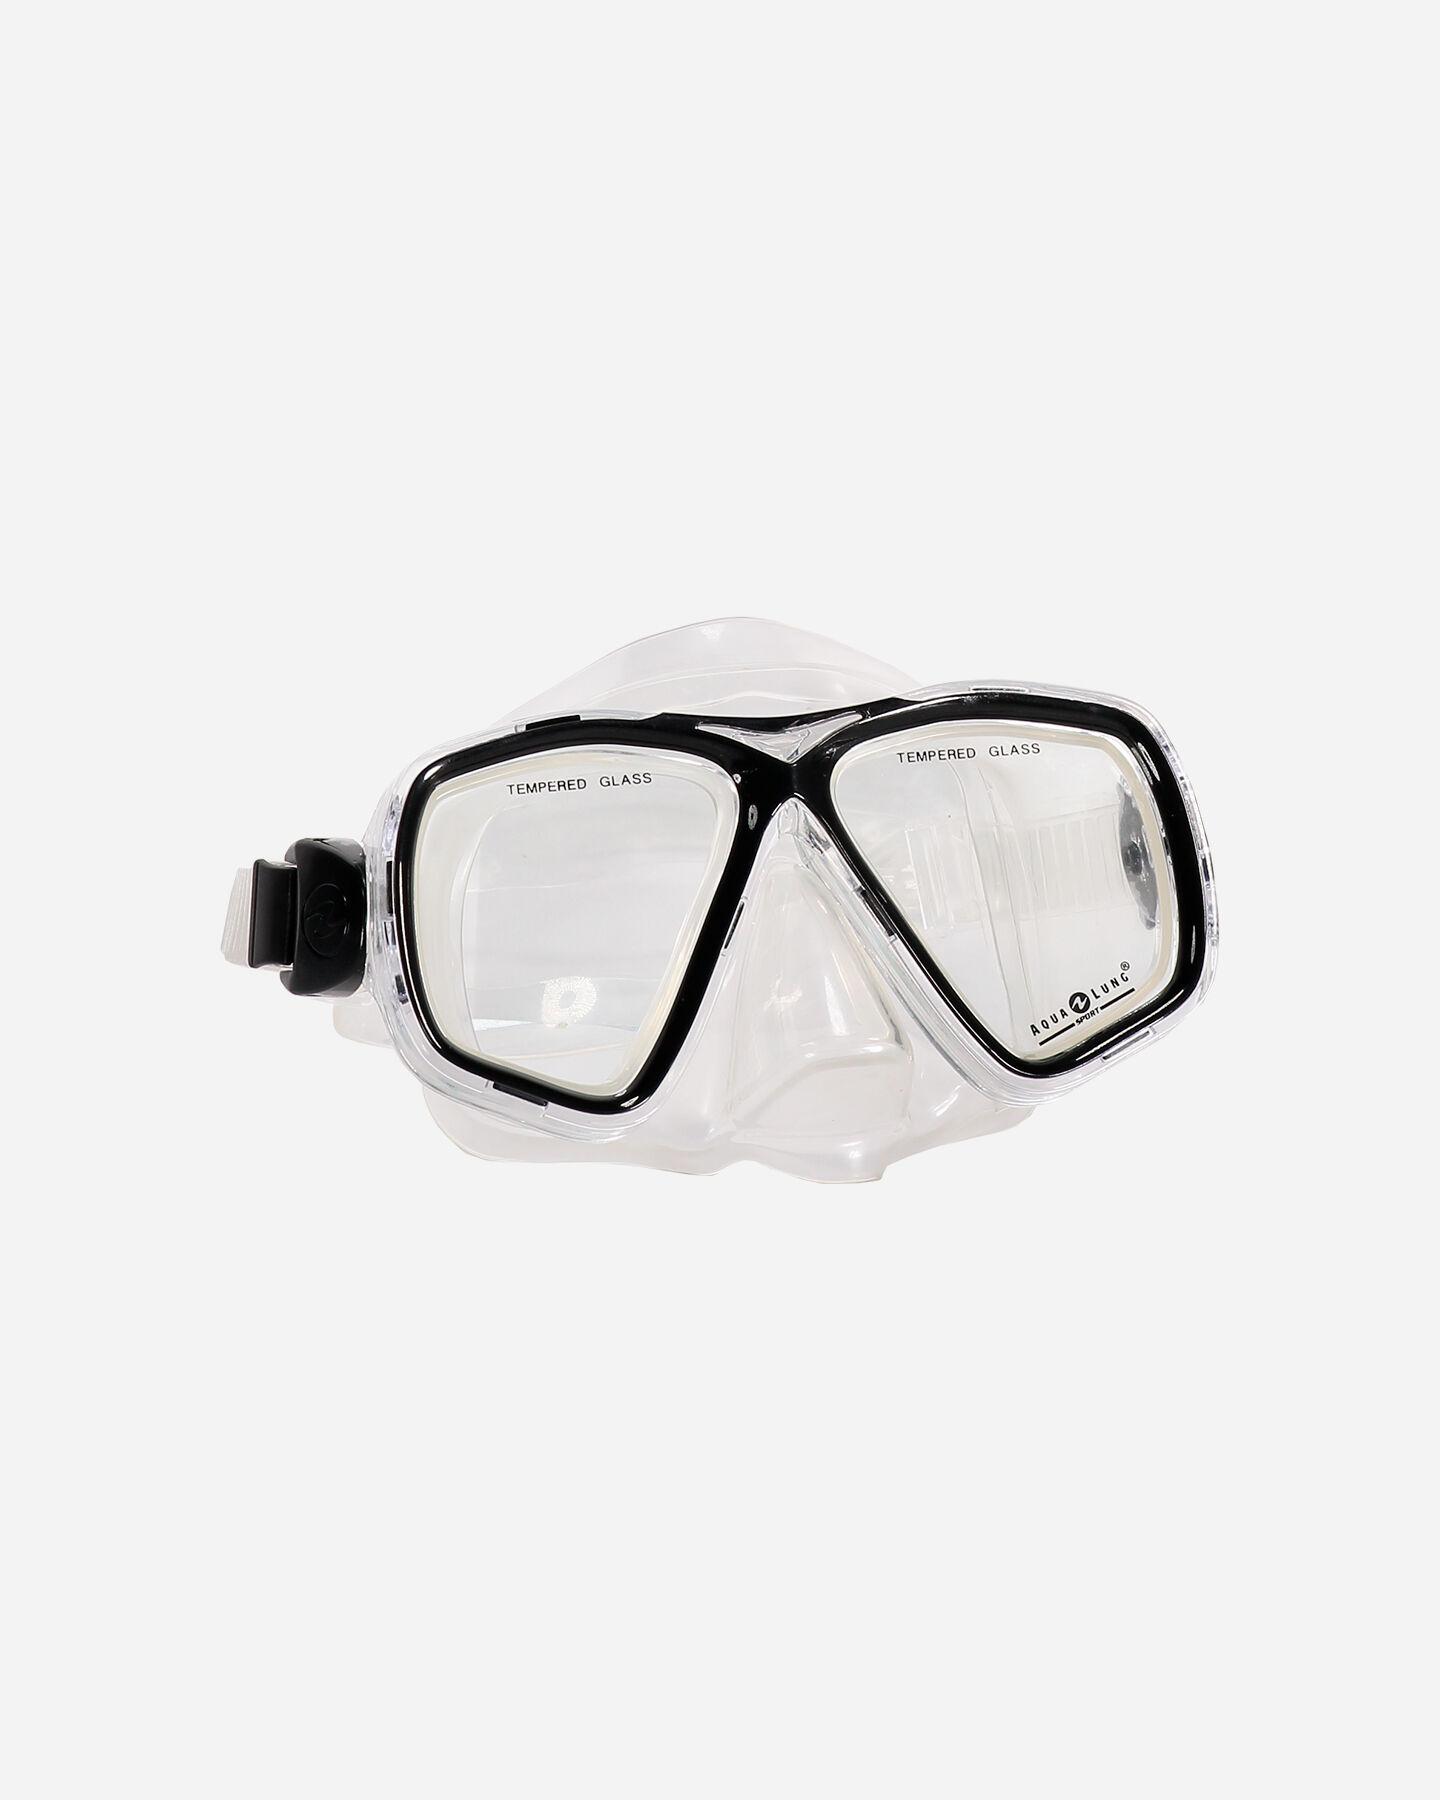 Kit snorkeling AQUALUNG SPORT ACAPULCO+BULA S1299381|101|UNI scatto 1